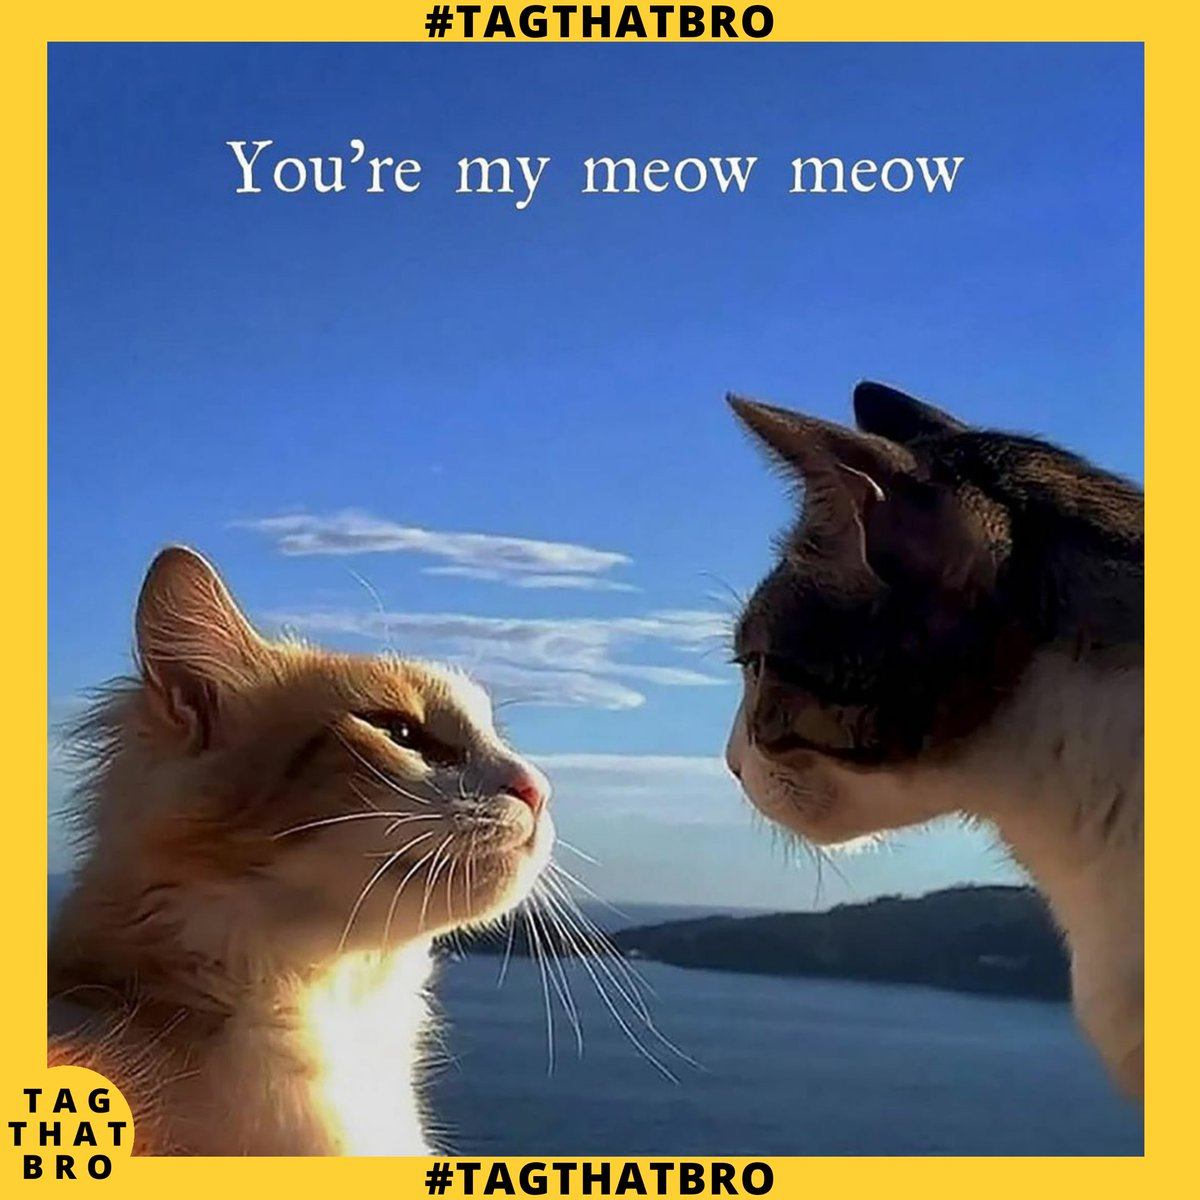 Tag That Bro - Follow us @tagthatbro  #tagthatbro #memes#dankmemes #memes#memesdaily #memesespanol #memestagram #funnymemes #edgymemes #memester #memesdank #memesfordays #memeschile #memesfunny #dailymemes #memess #memestar #memestagram #memesrlife #memesquadpic.twitter.com/PXt41YZtca